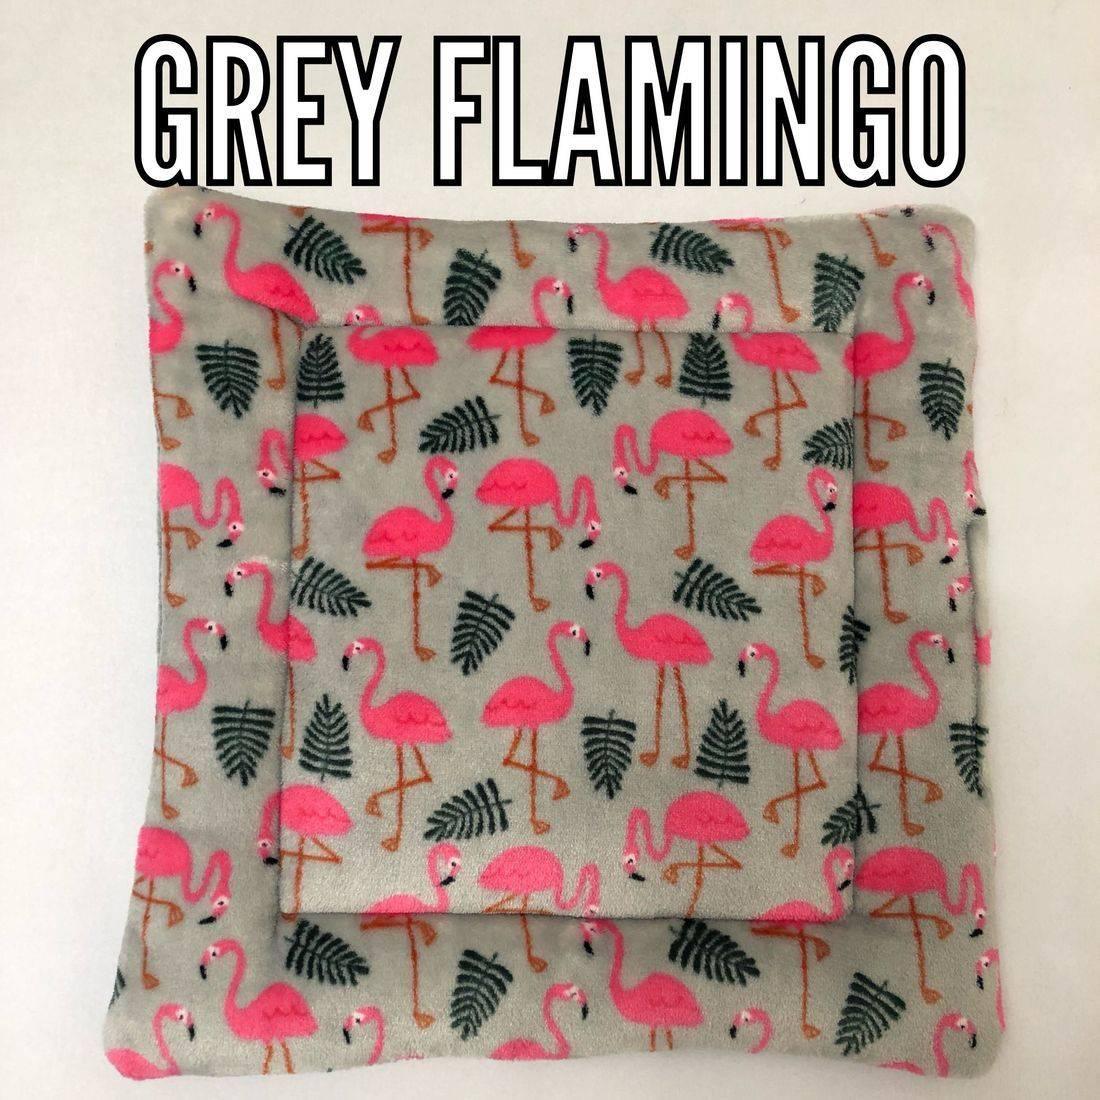 grey Flamingo fabric